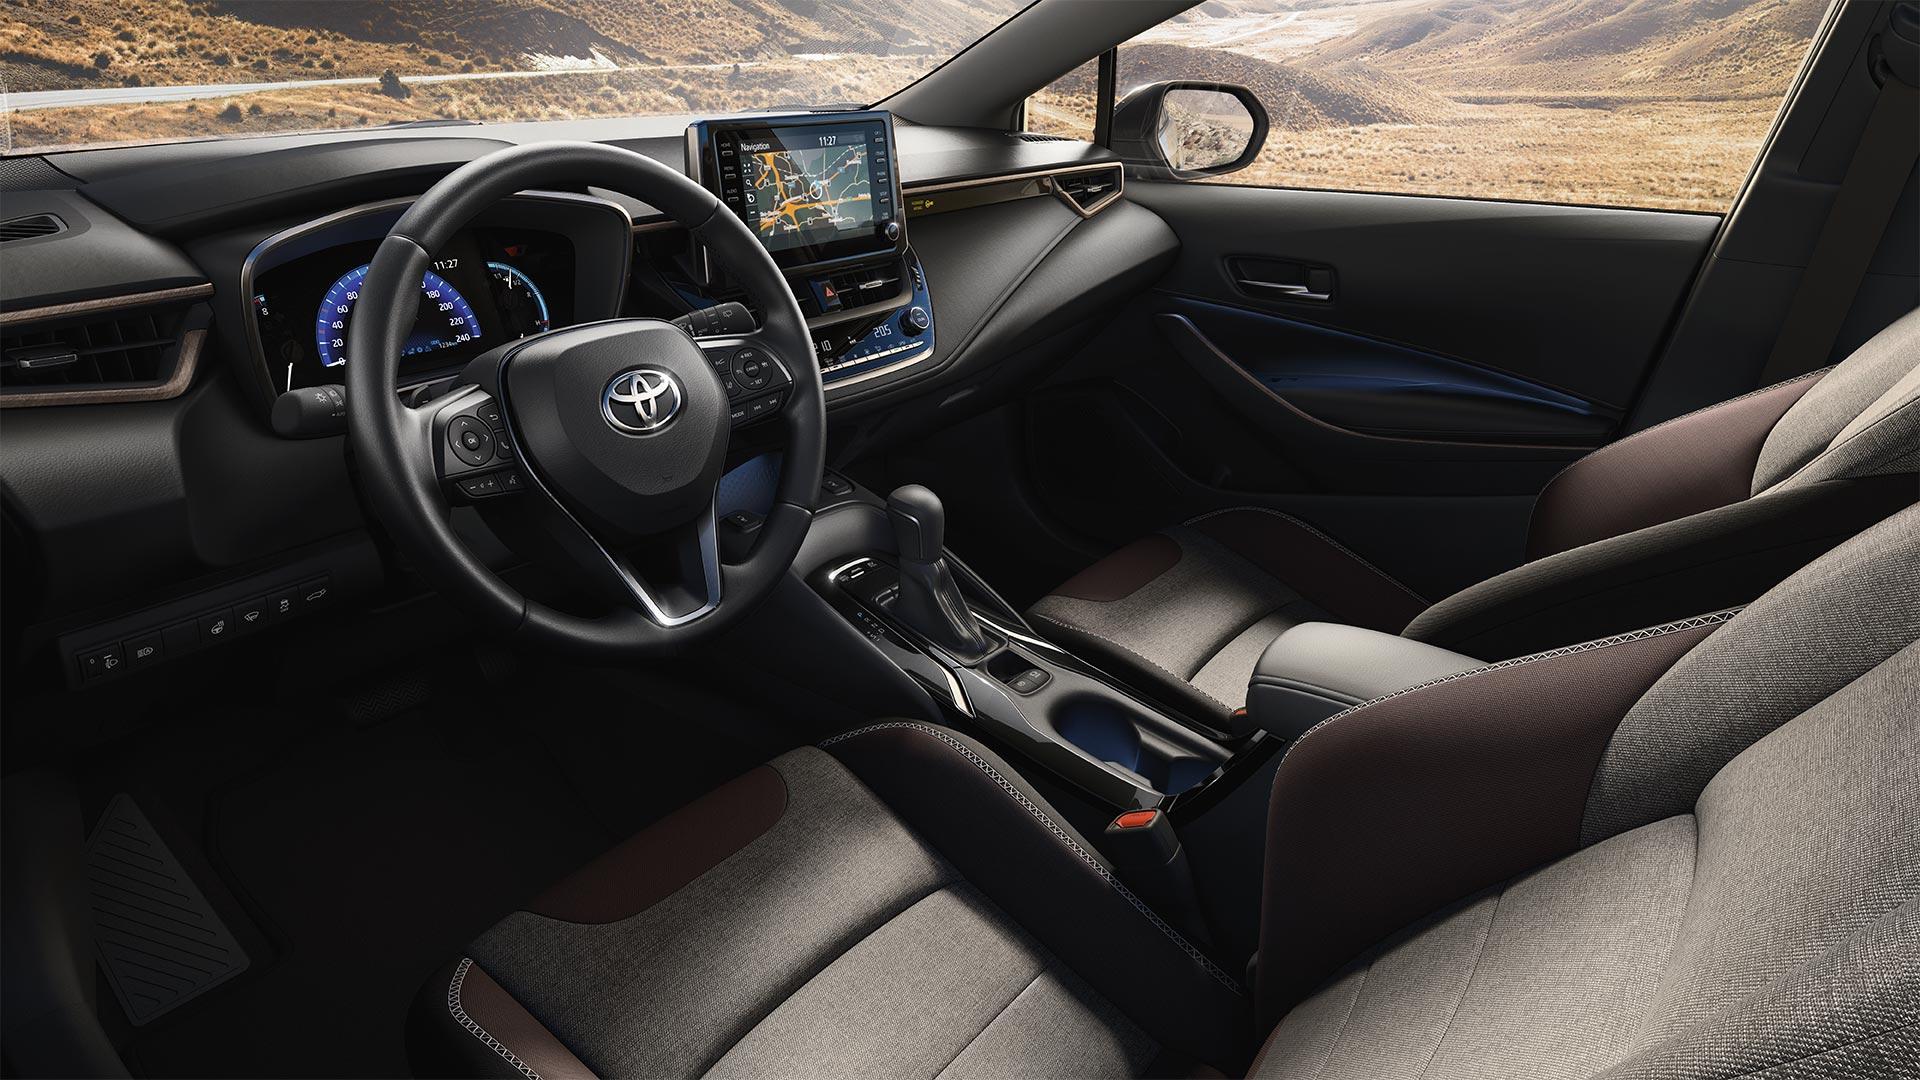 2020 Toyota Avensis Interior